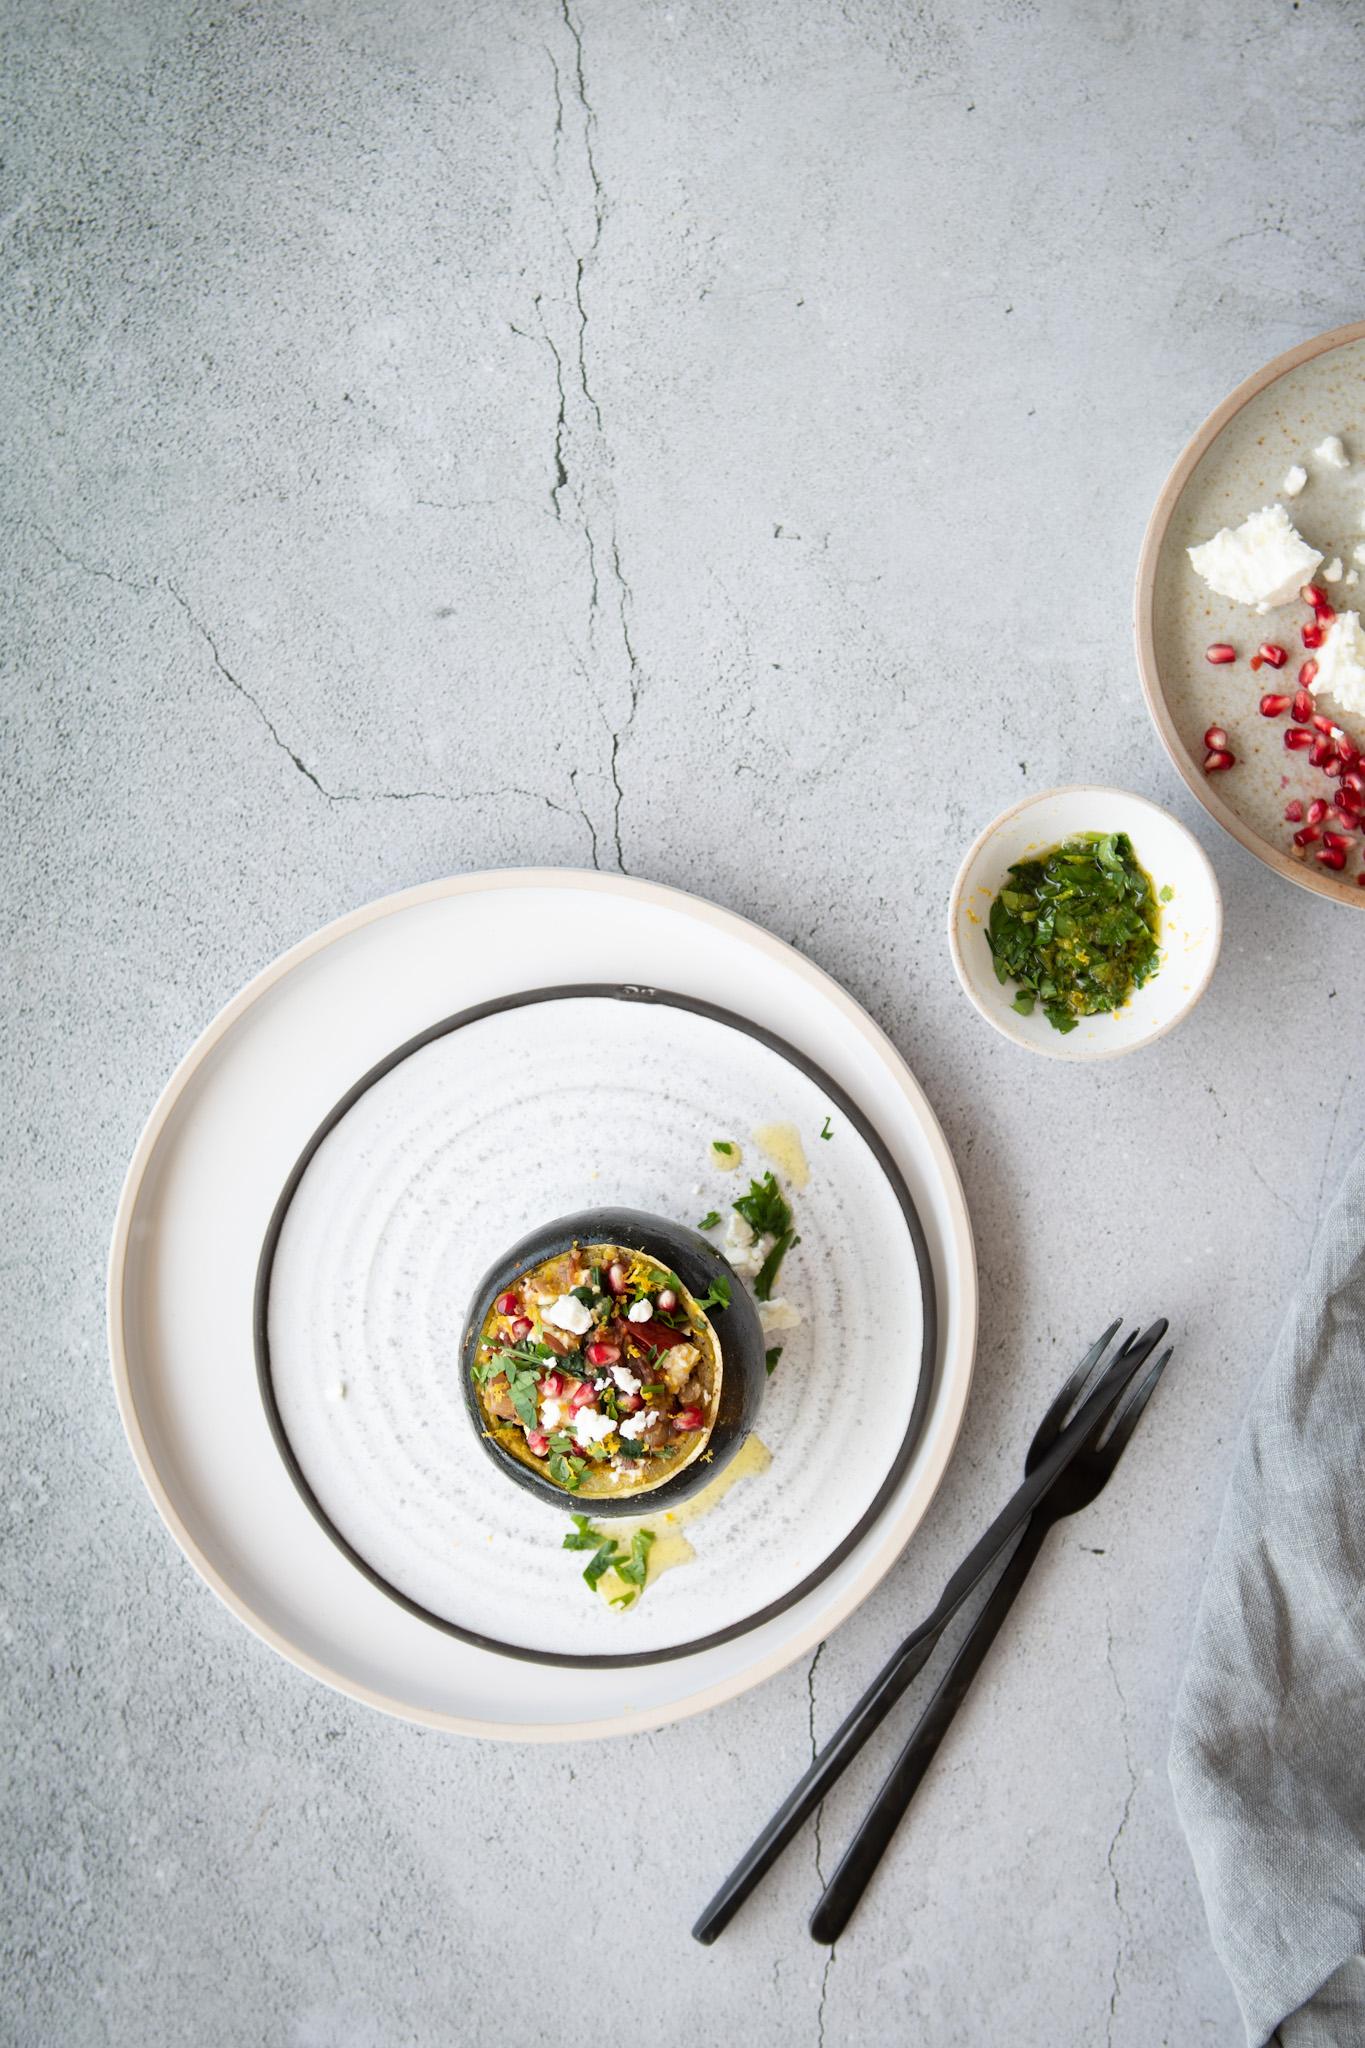 Mushroom & Spinach stuffed Squash